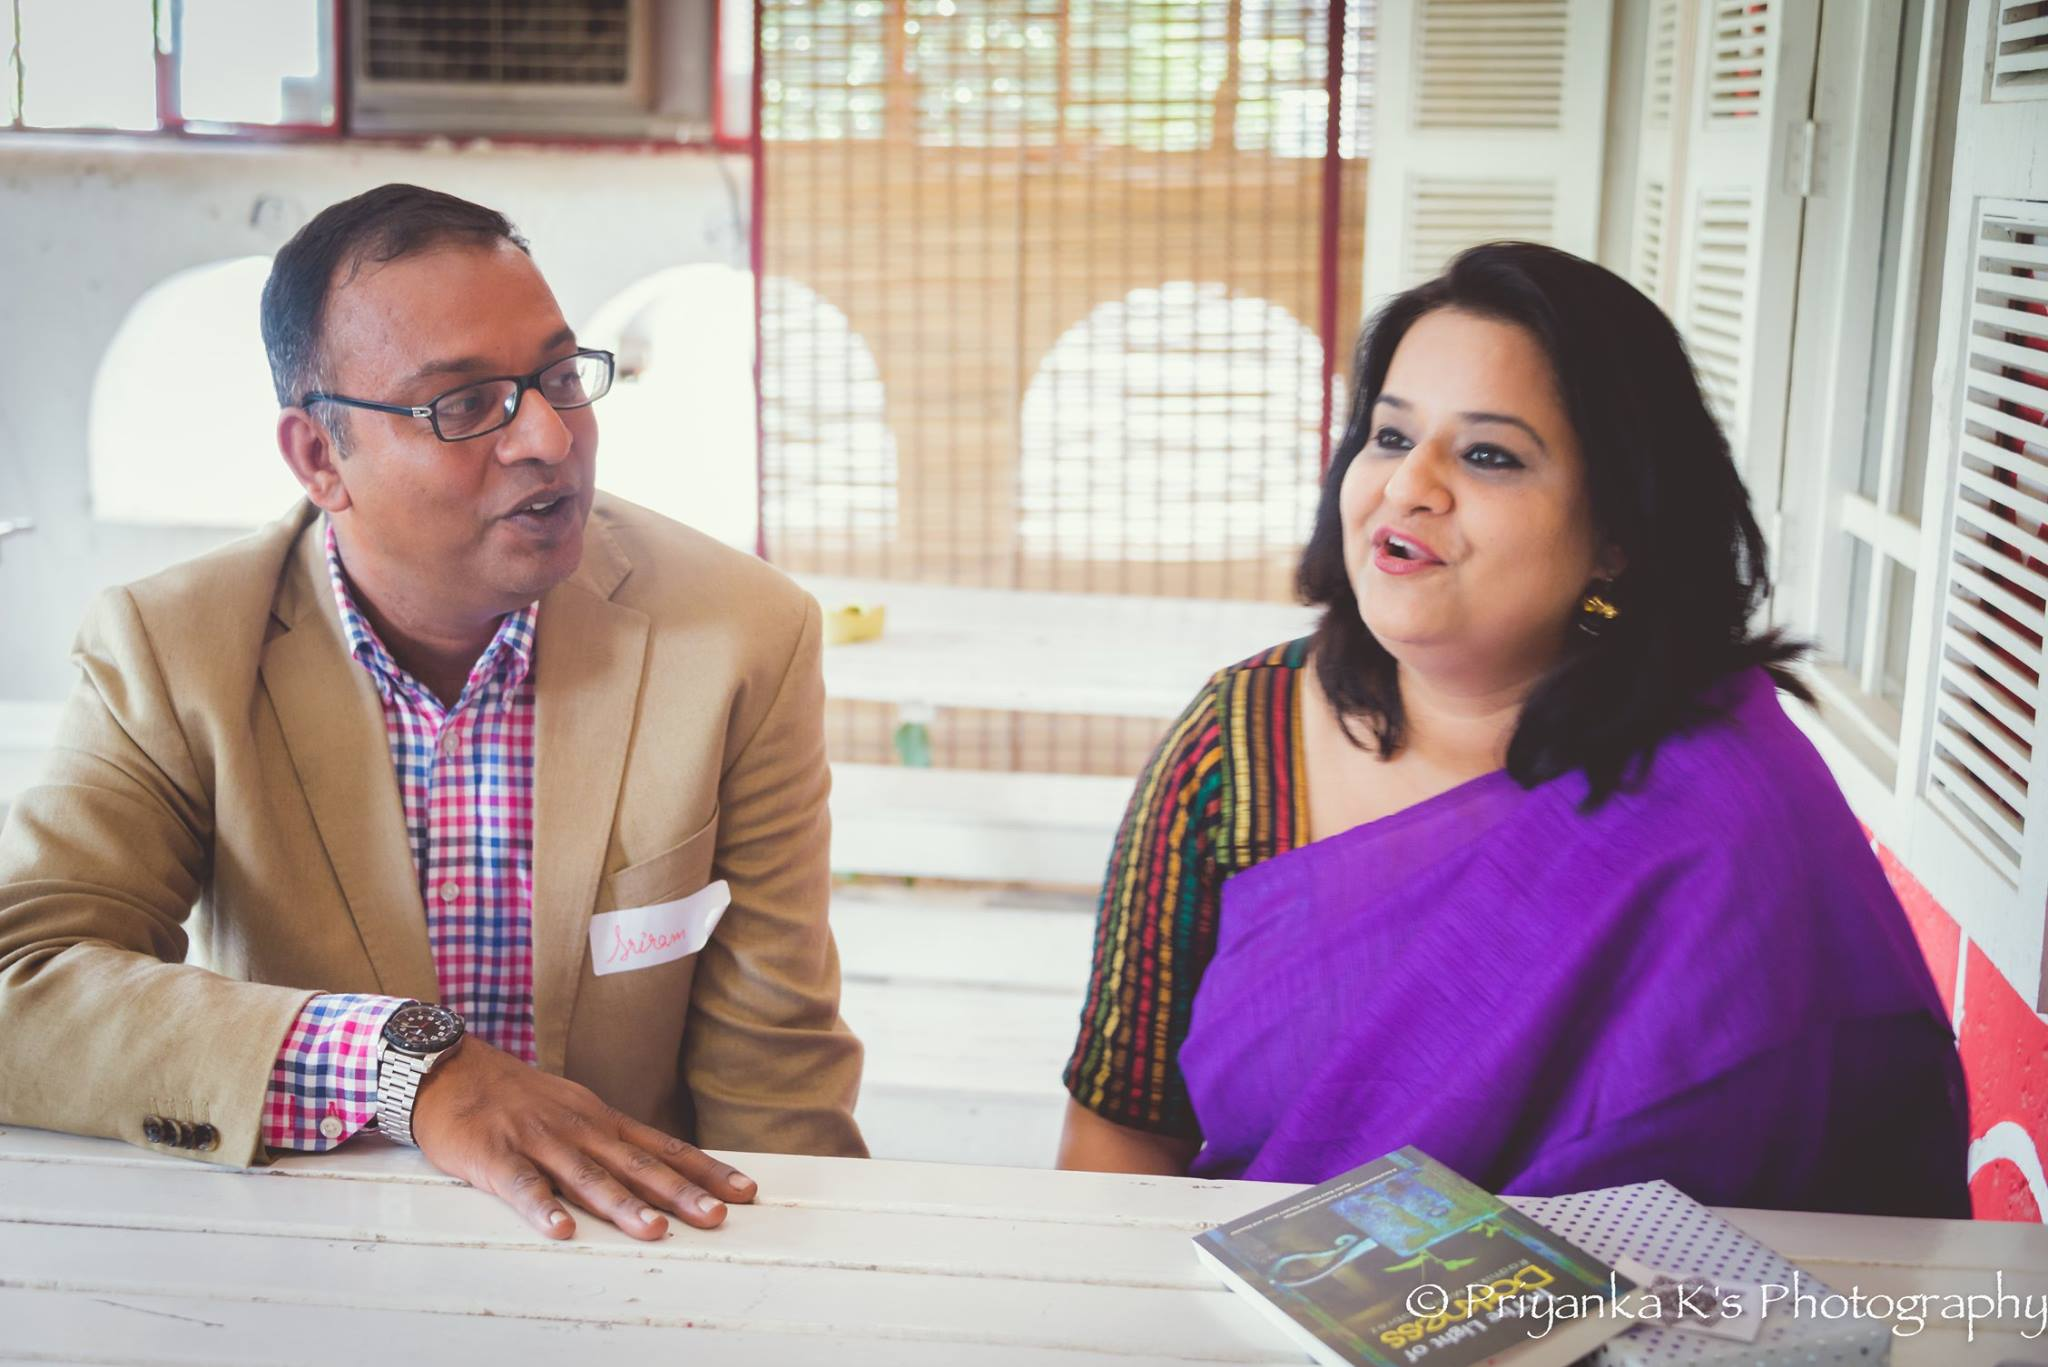 Author Sriram Subramanian's Rain at LitTrio – A GurgaonMoms Book Club Event